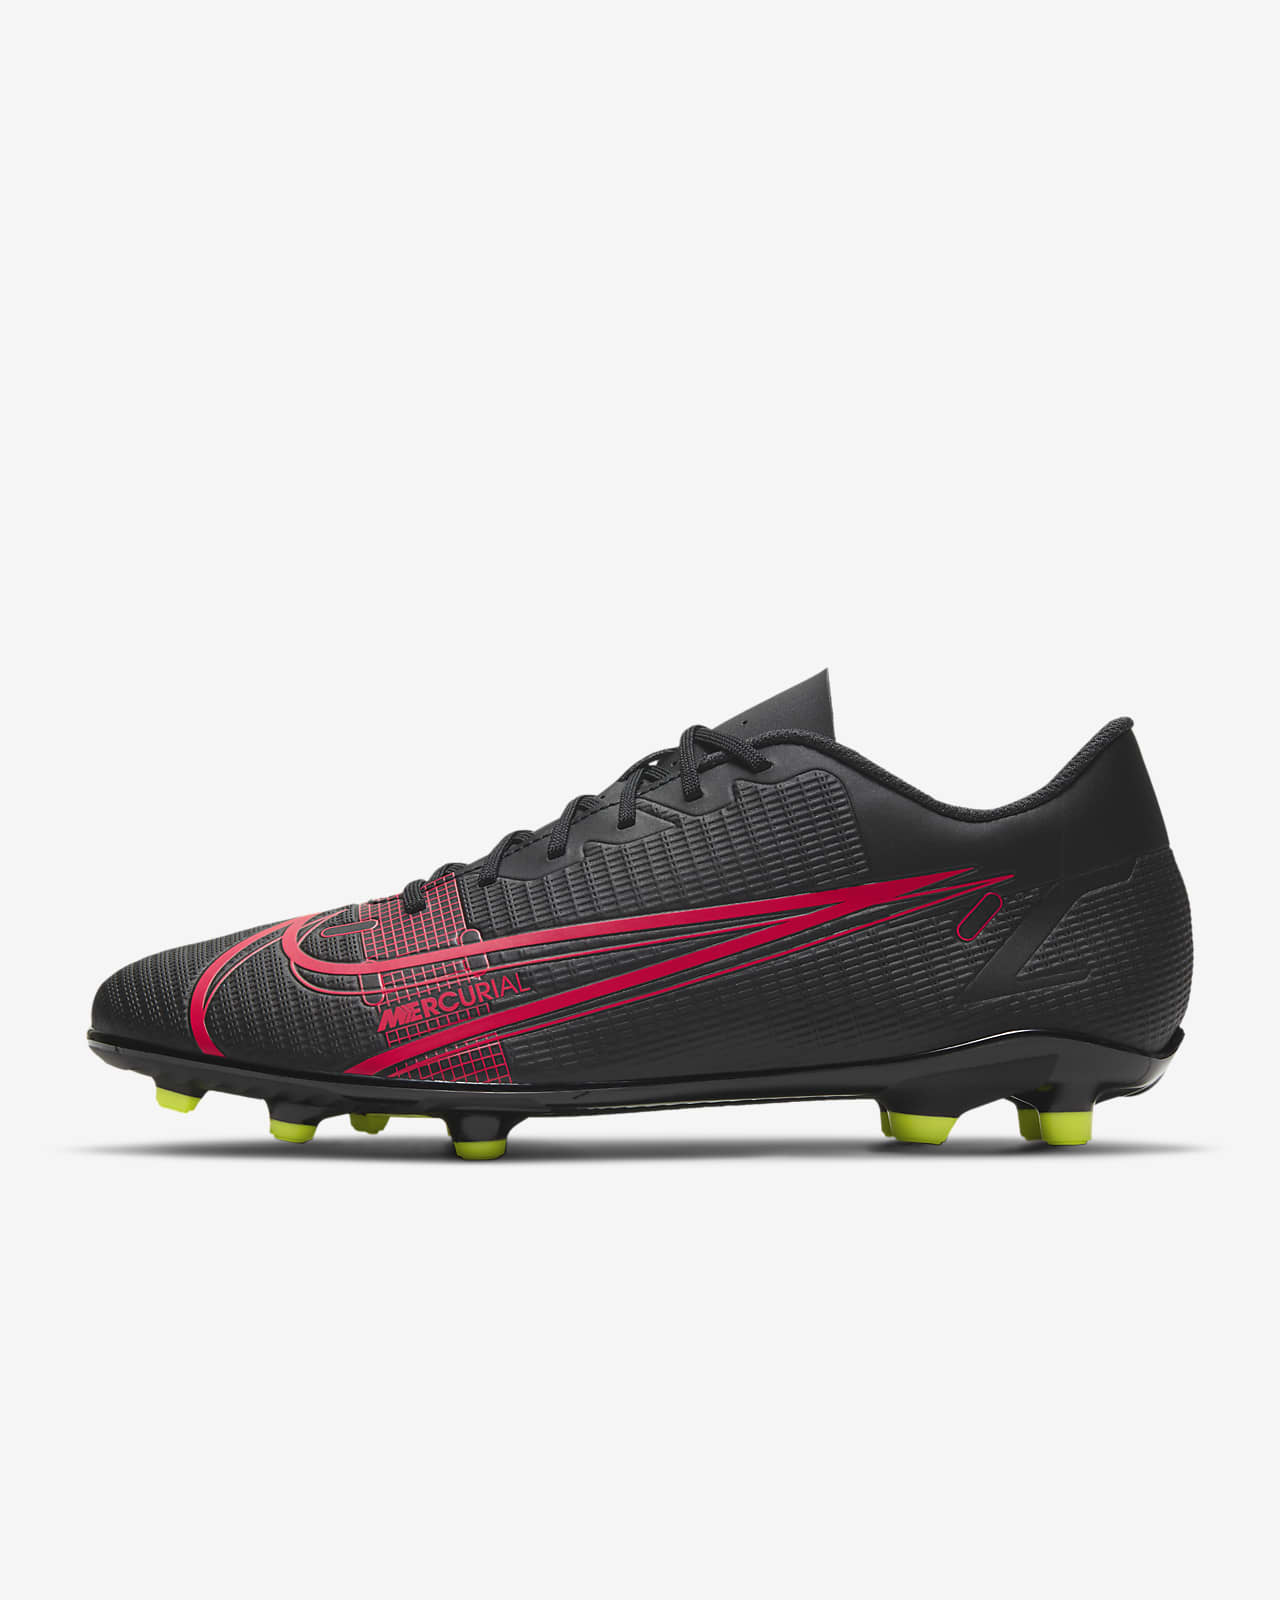 Chaussure de football multi-surfaces à crampons Nike Mercurial ...